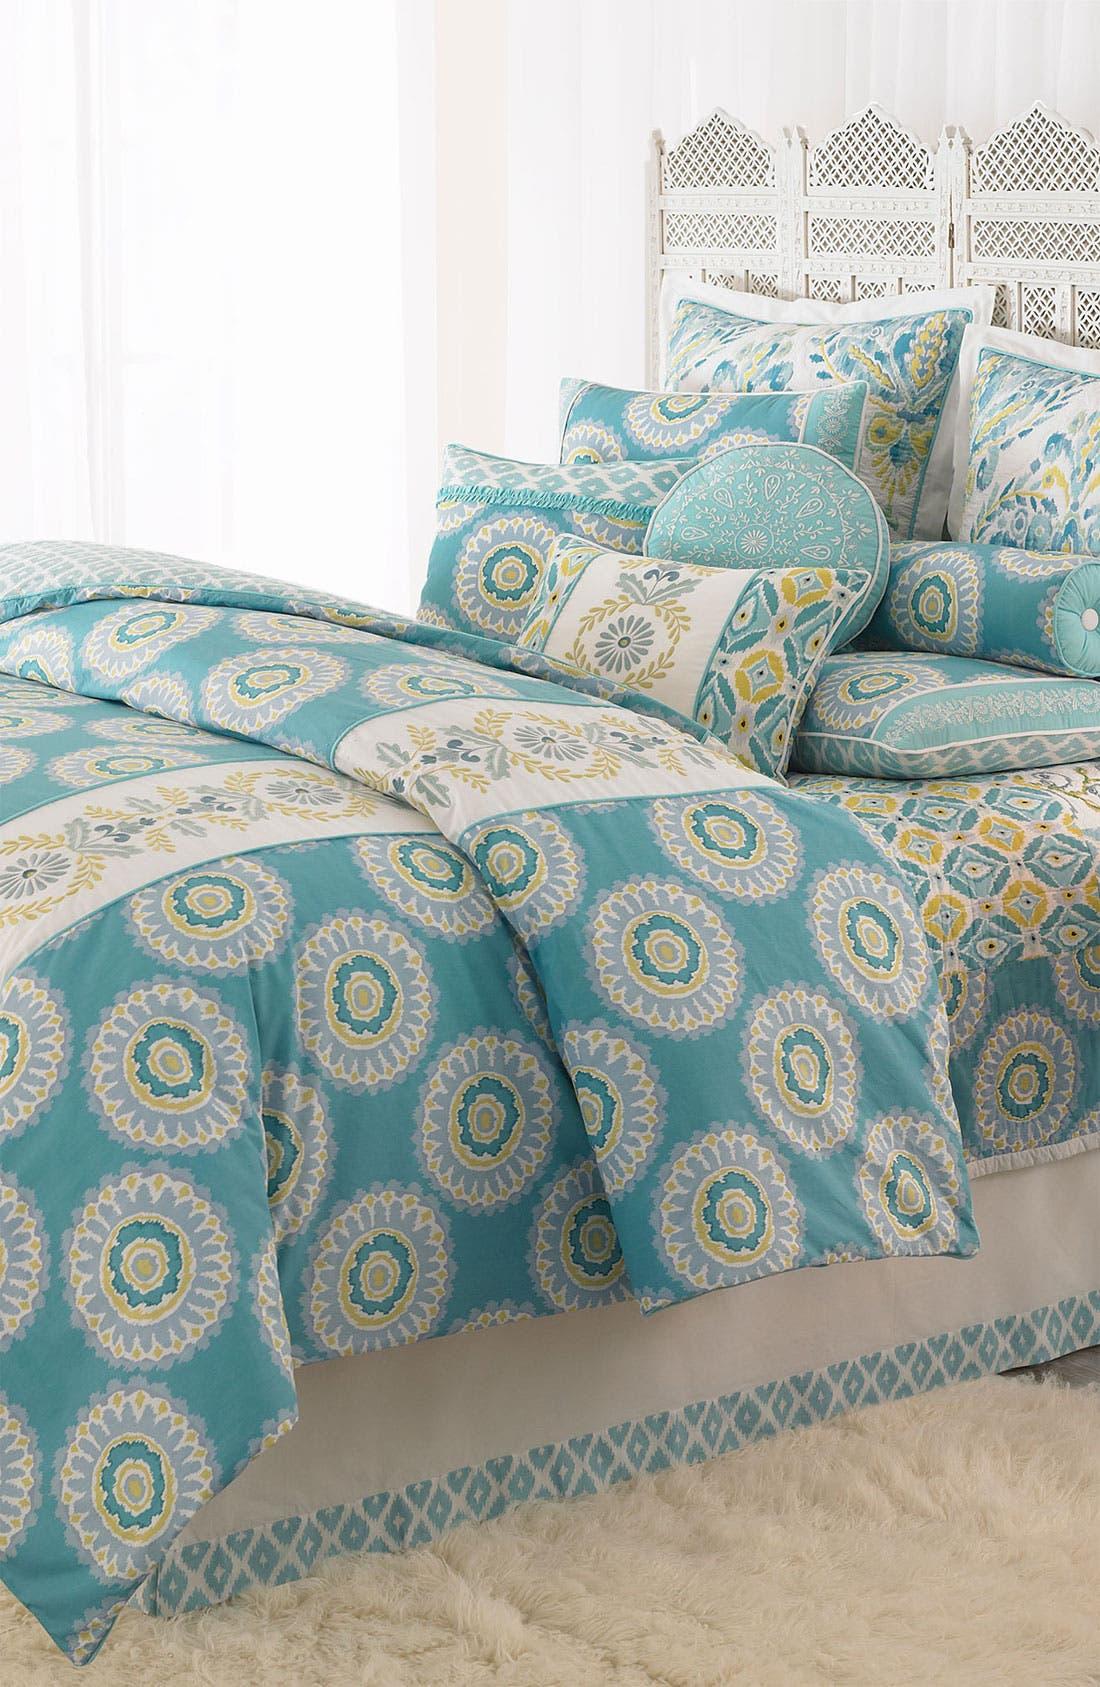 Alternate Image 1 Selected - Dena Home 'Azure Sky' Comforter